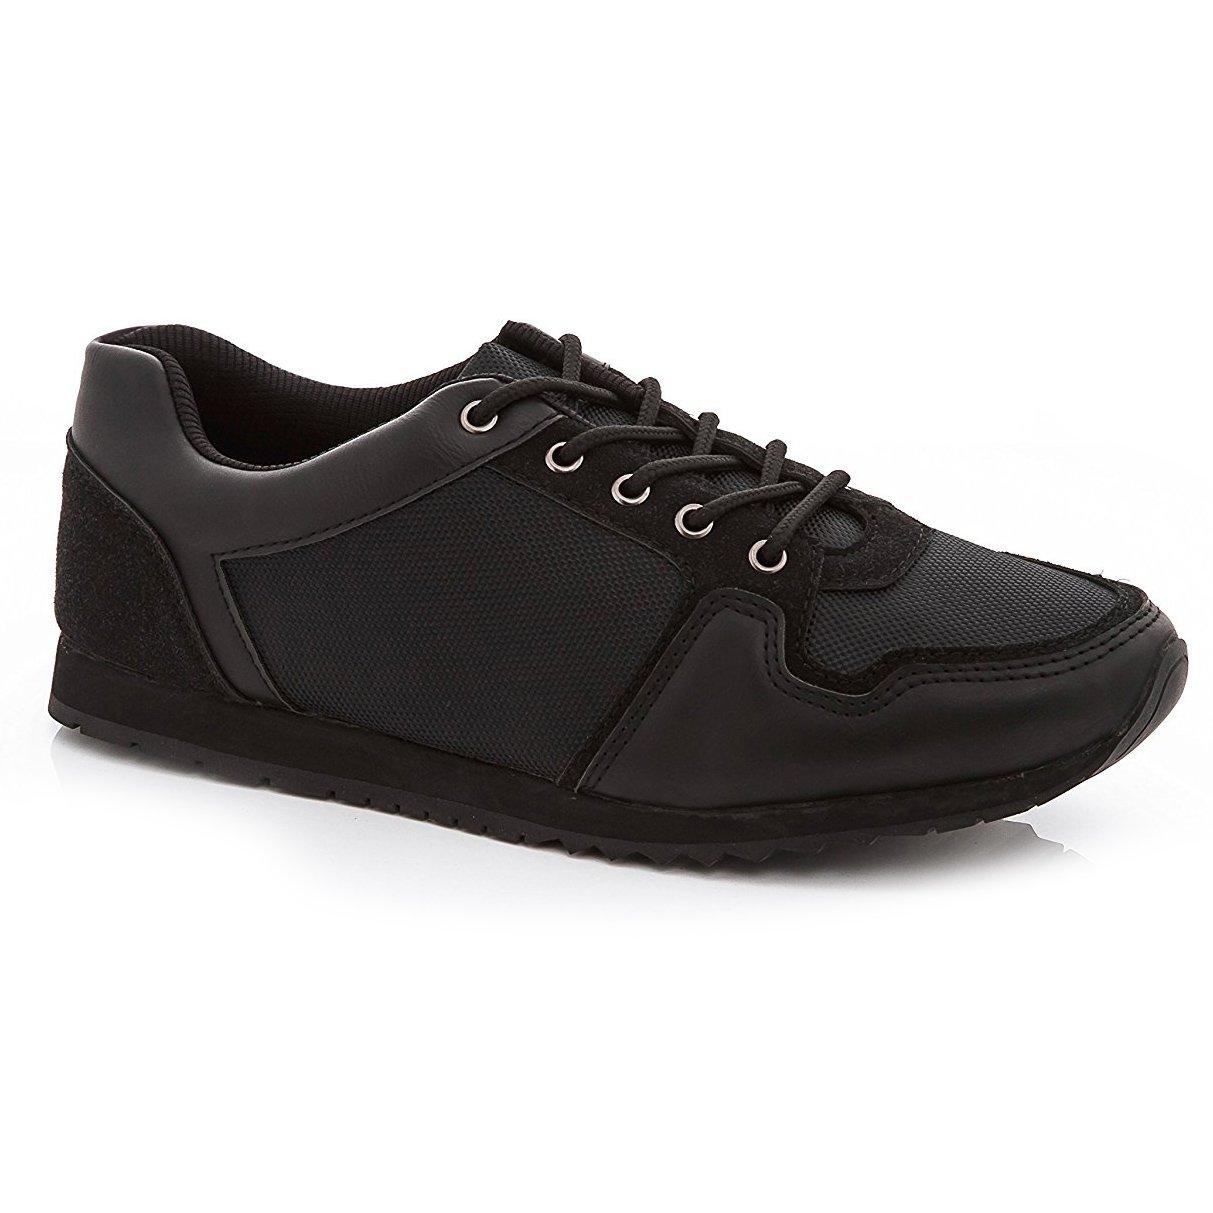 Franco Vanucci Mens 9994 Lace Up Sneakers Black Black Size 11 by Franco Vanucci